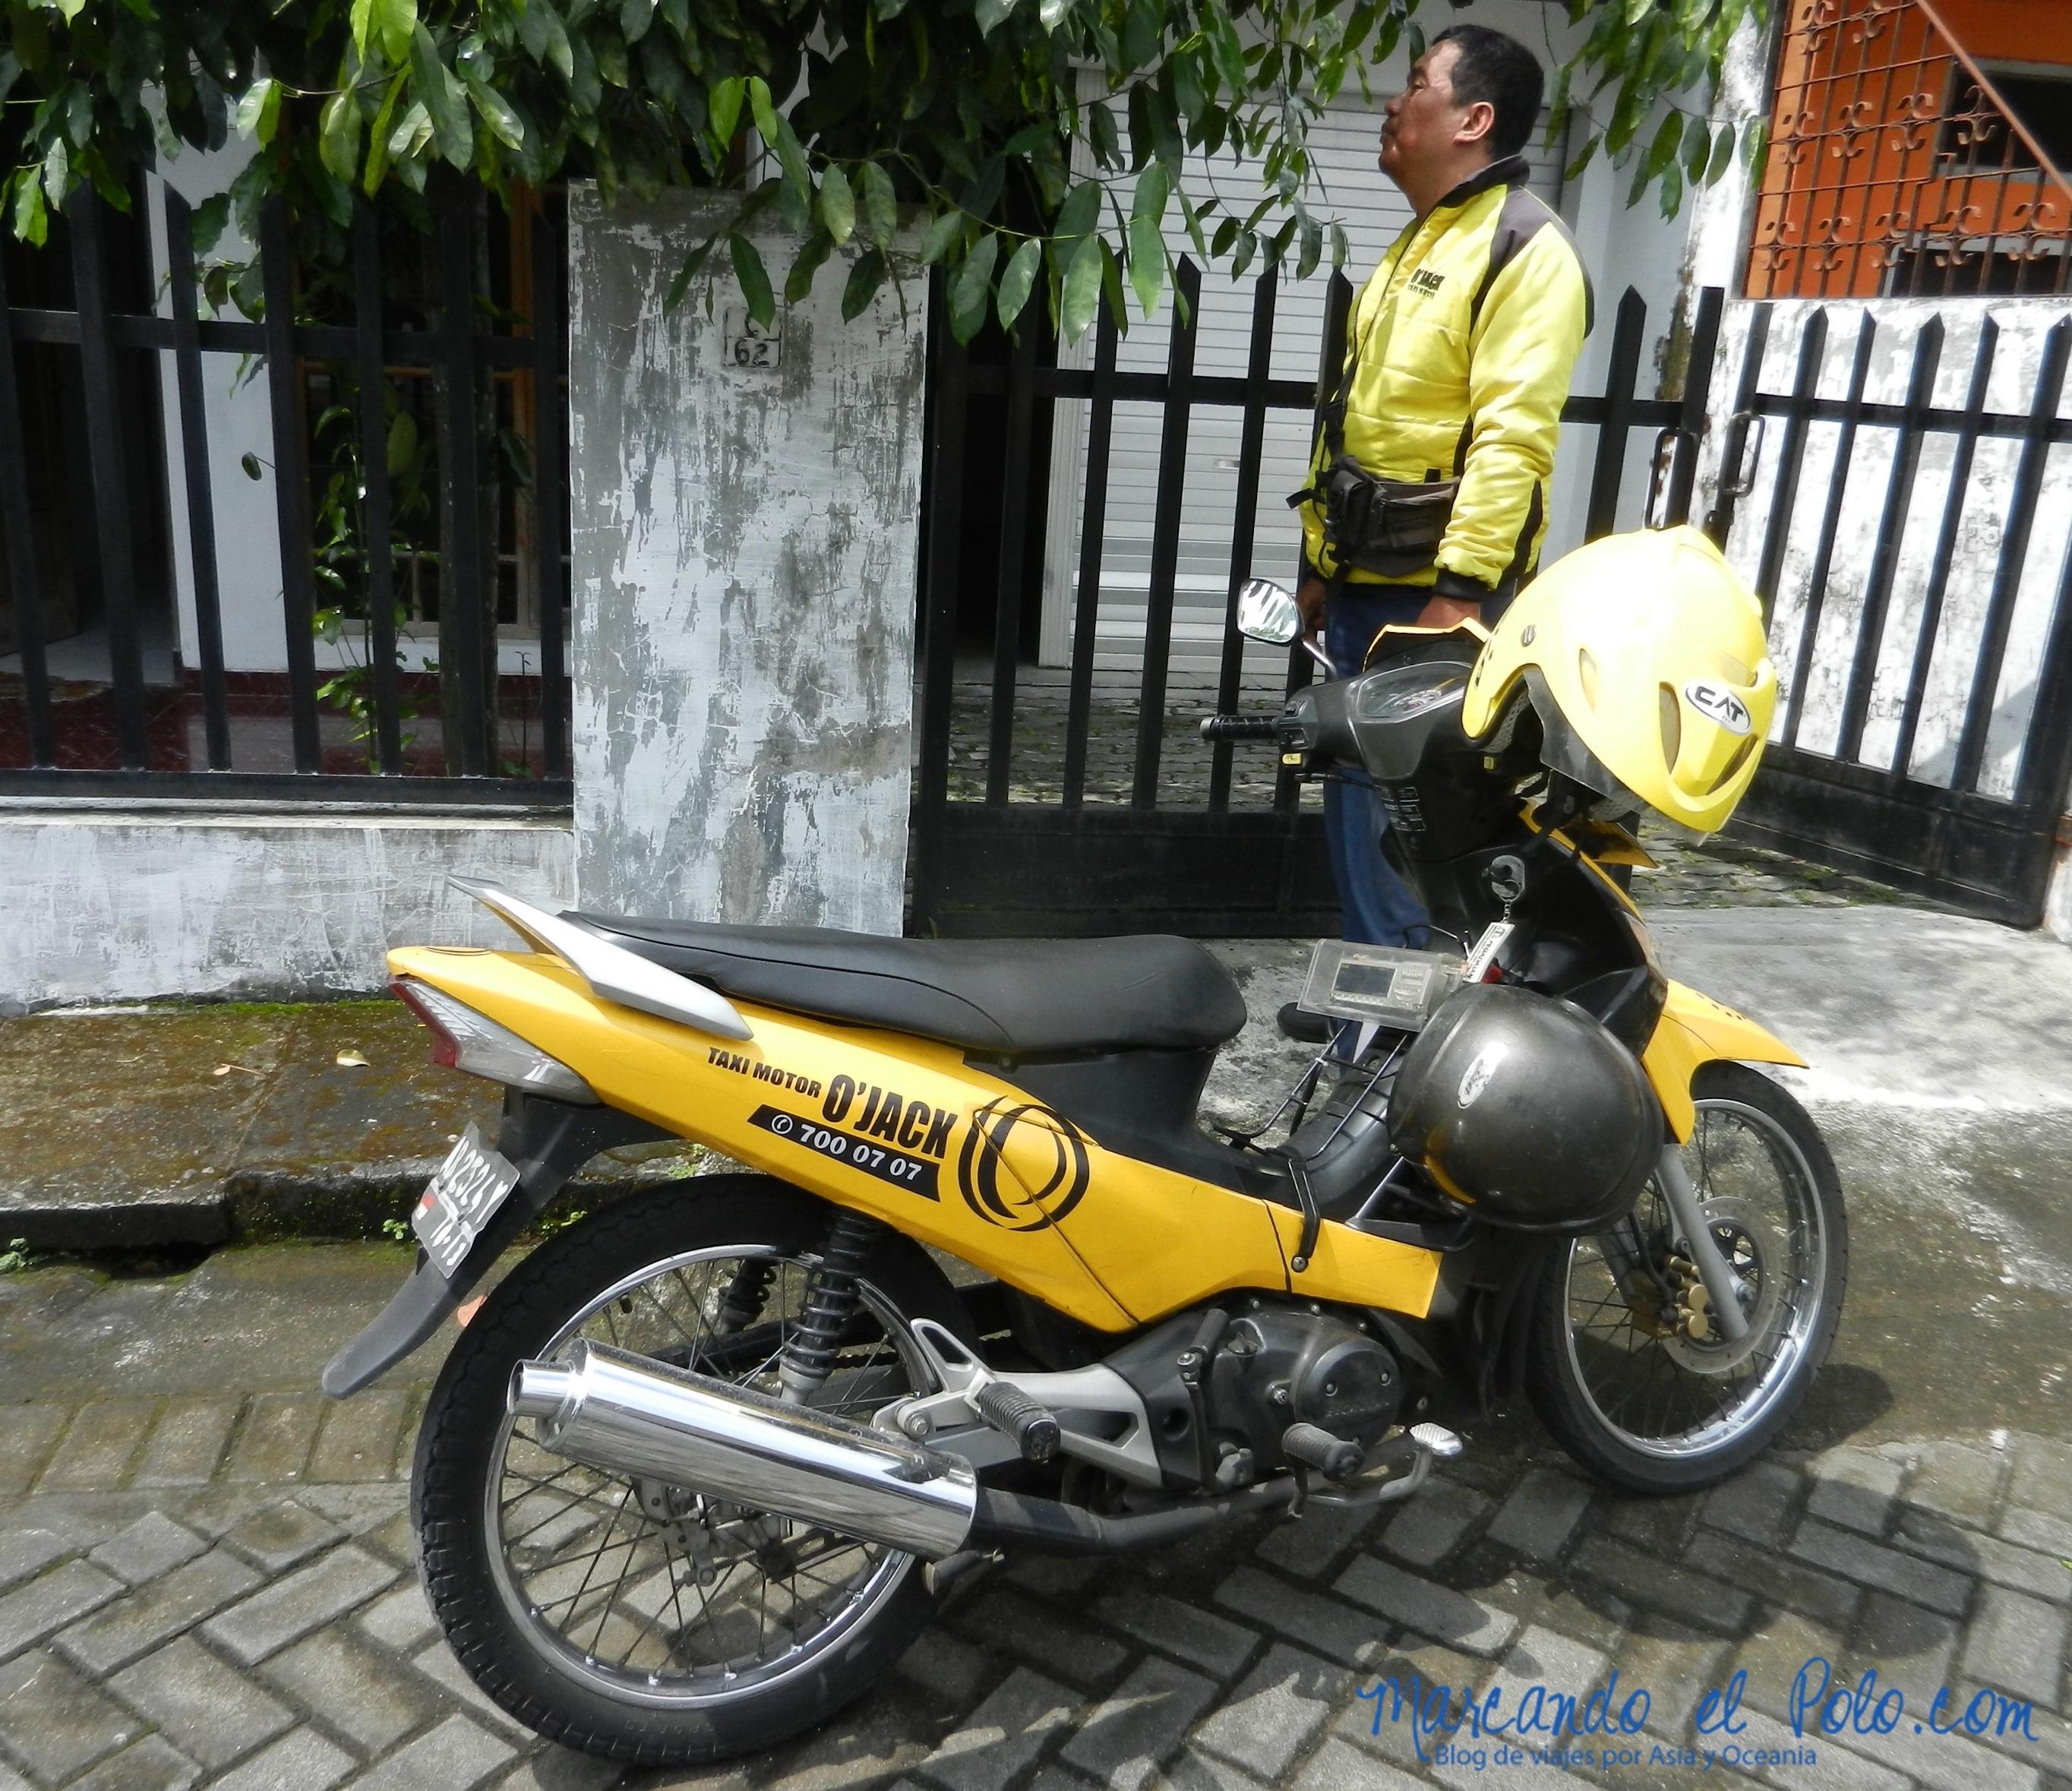 Viajar por Indonesia